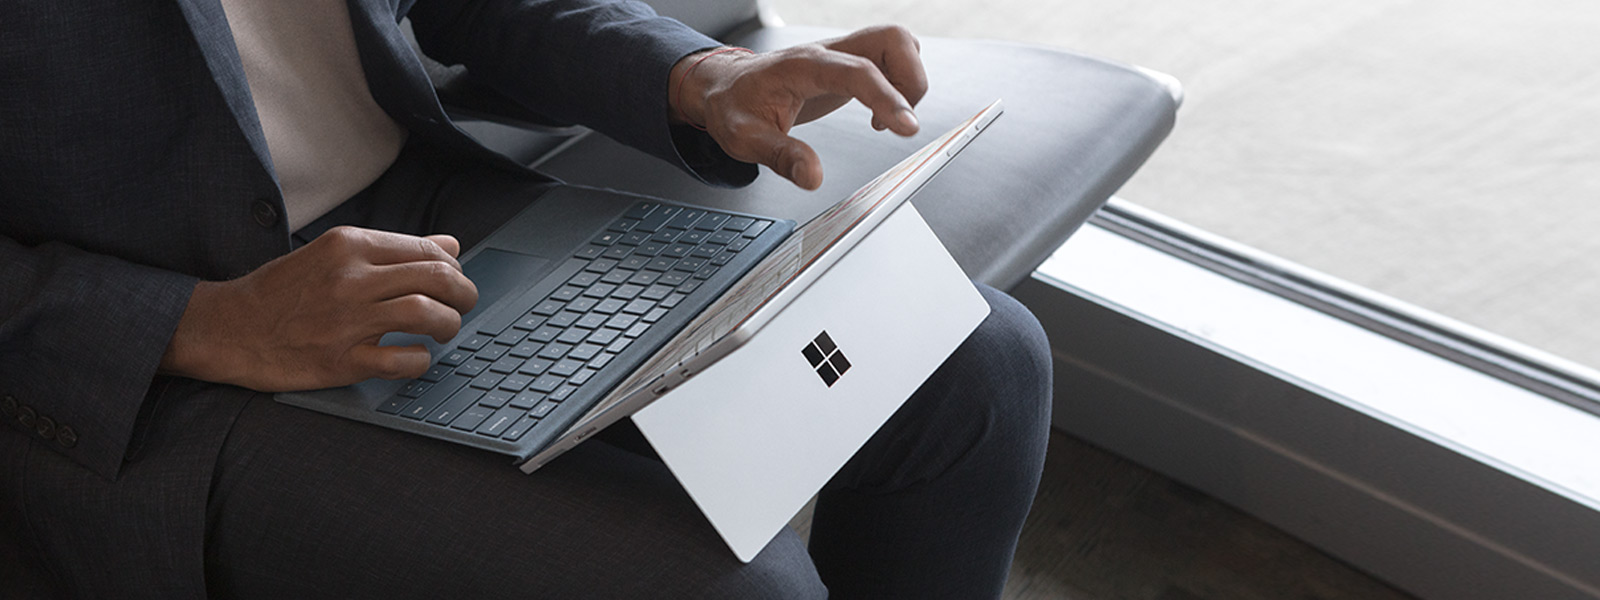 Un hombre trabaja con Surface Pro 6 en modo Portátil